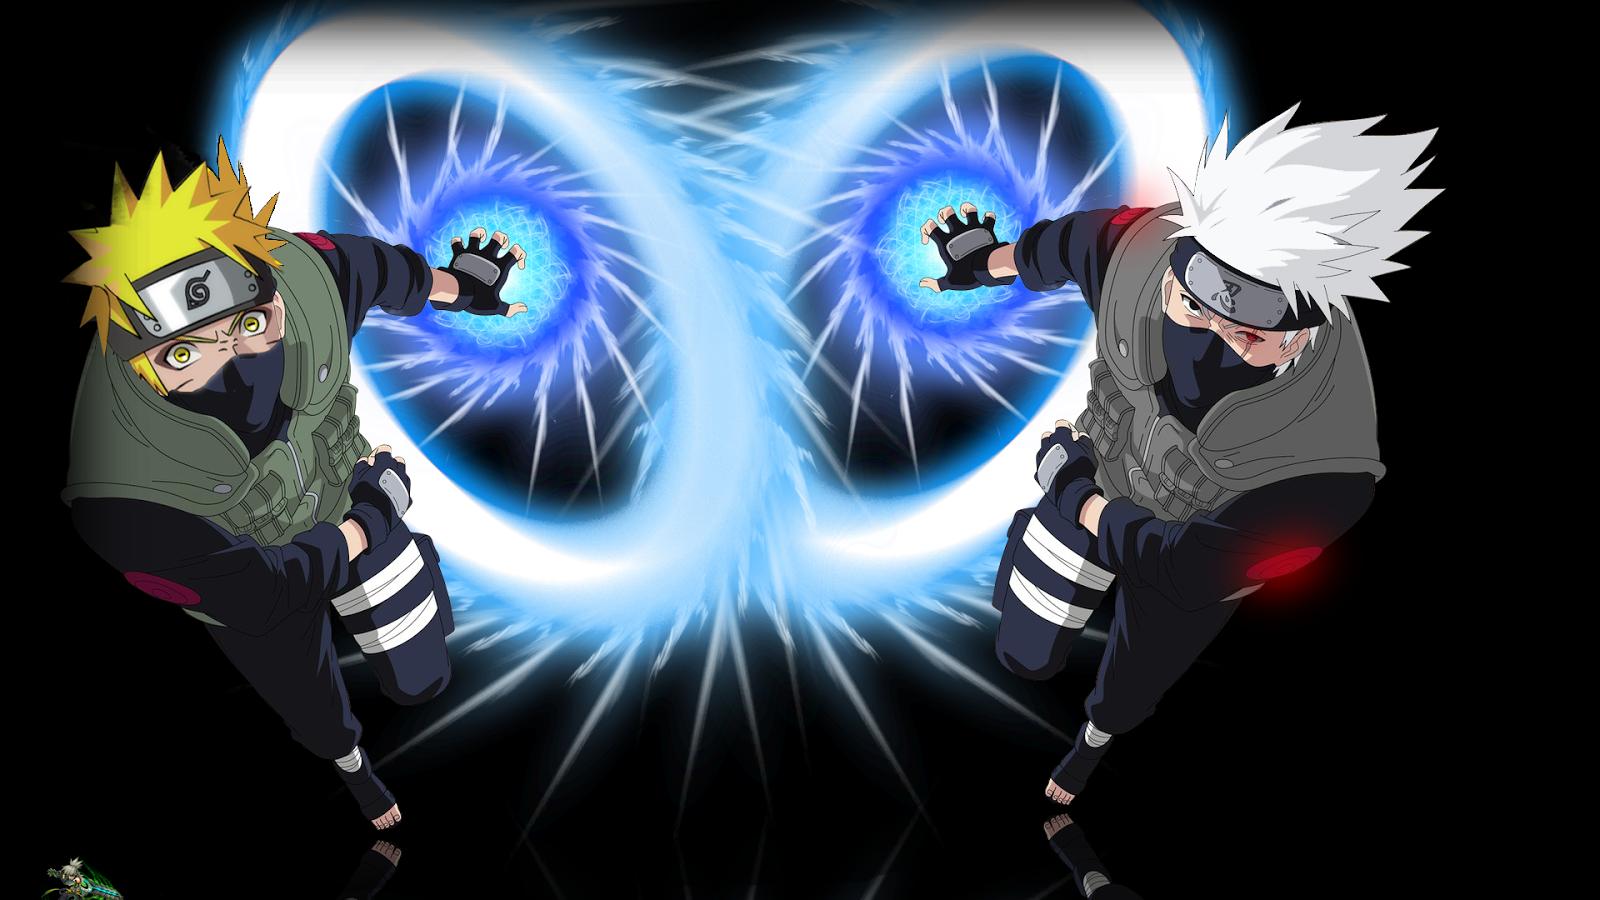 Free Download Kakashi Naruto Wallpaper 1600x1000 For Your